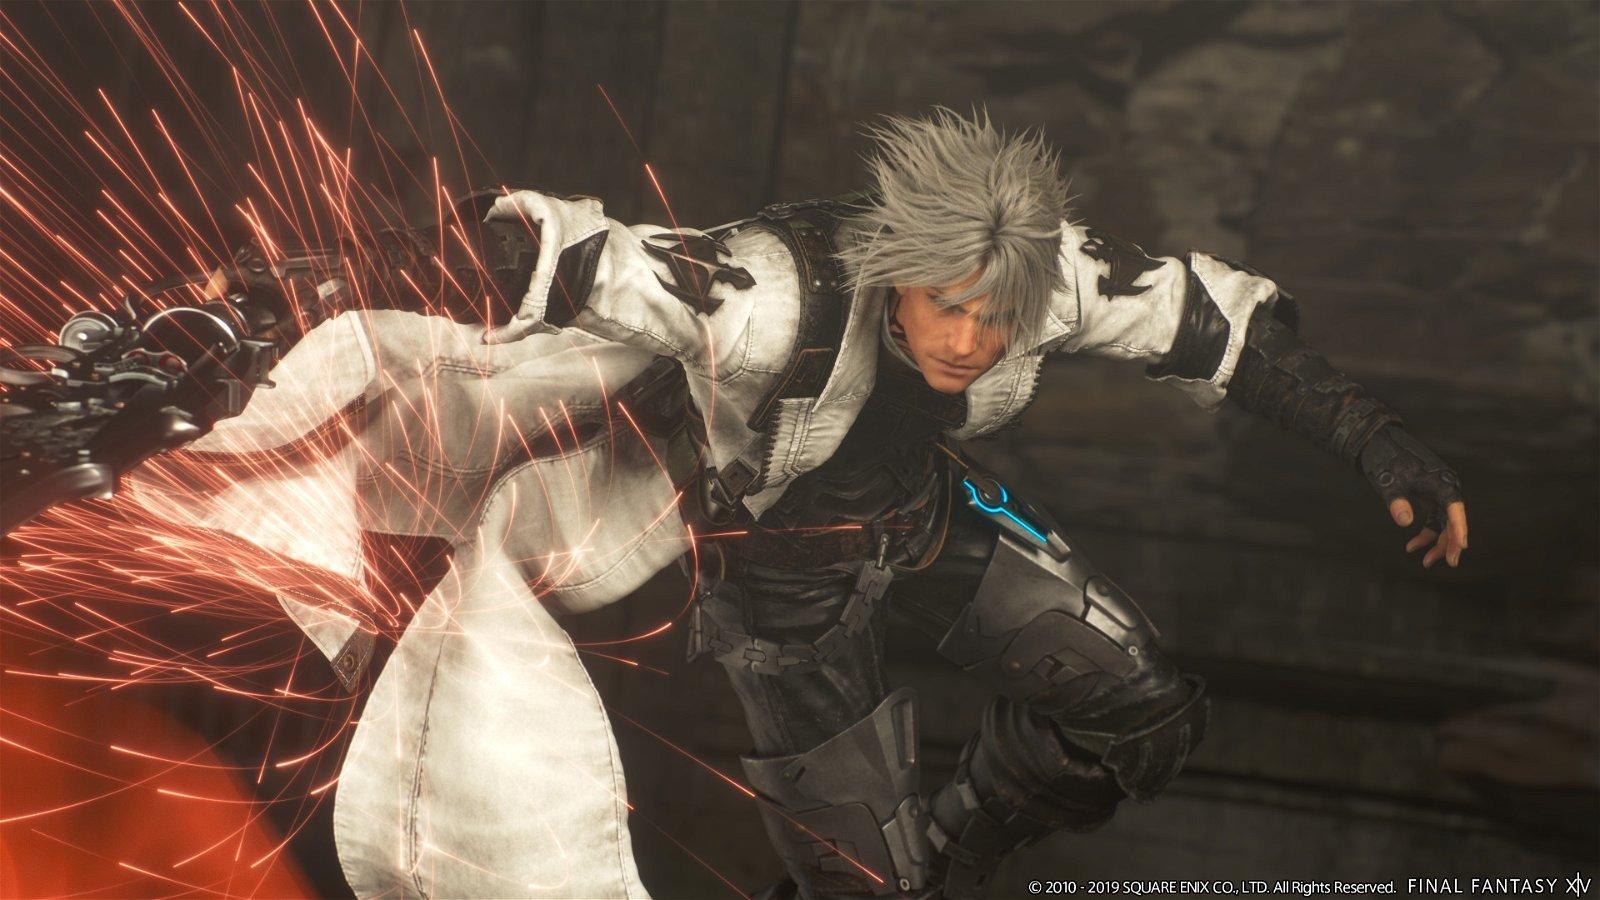 New Final Fantasy XIV: Shadowbringers Details, NieR Automata Collaboration Revealed at Paris Fan Festival 3